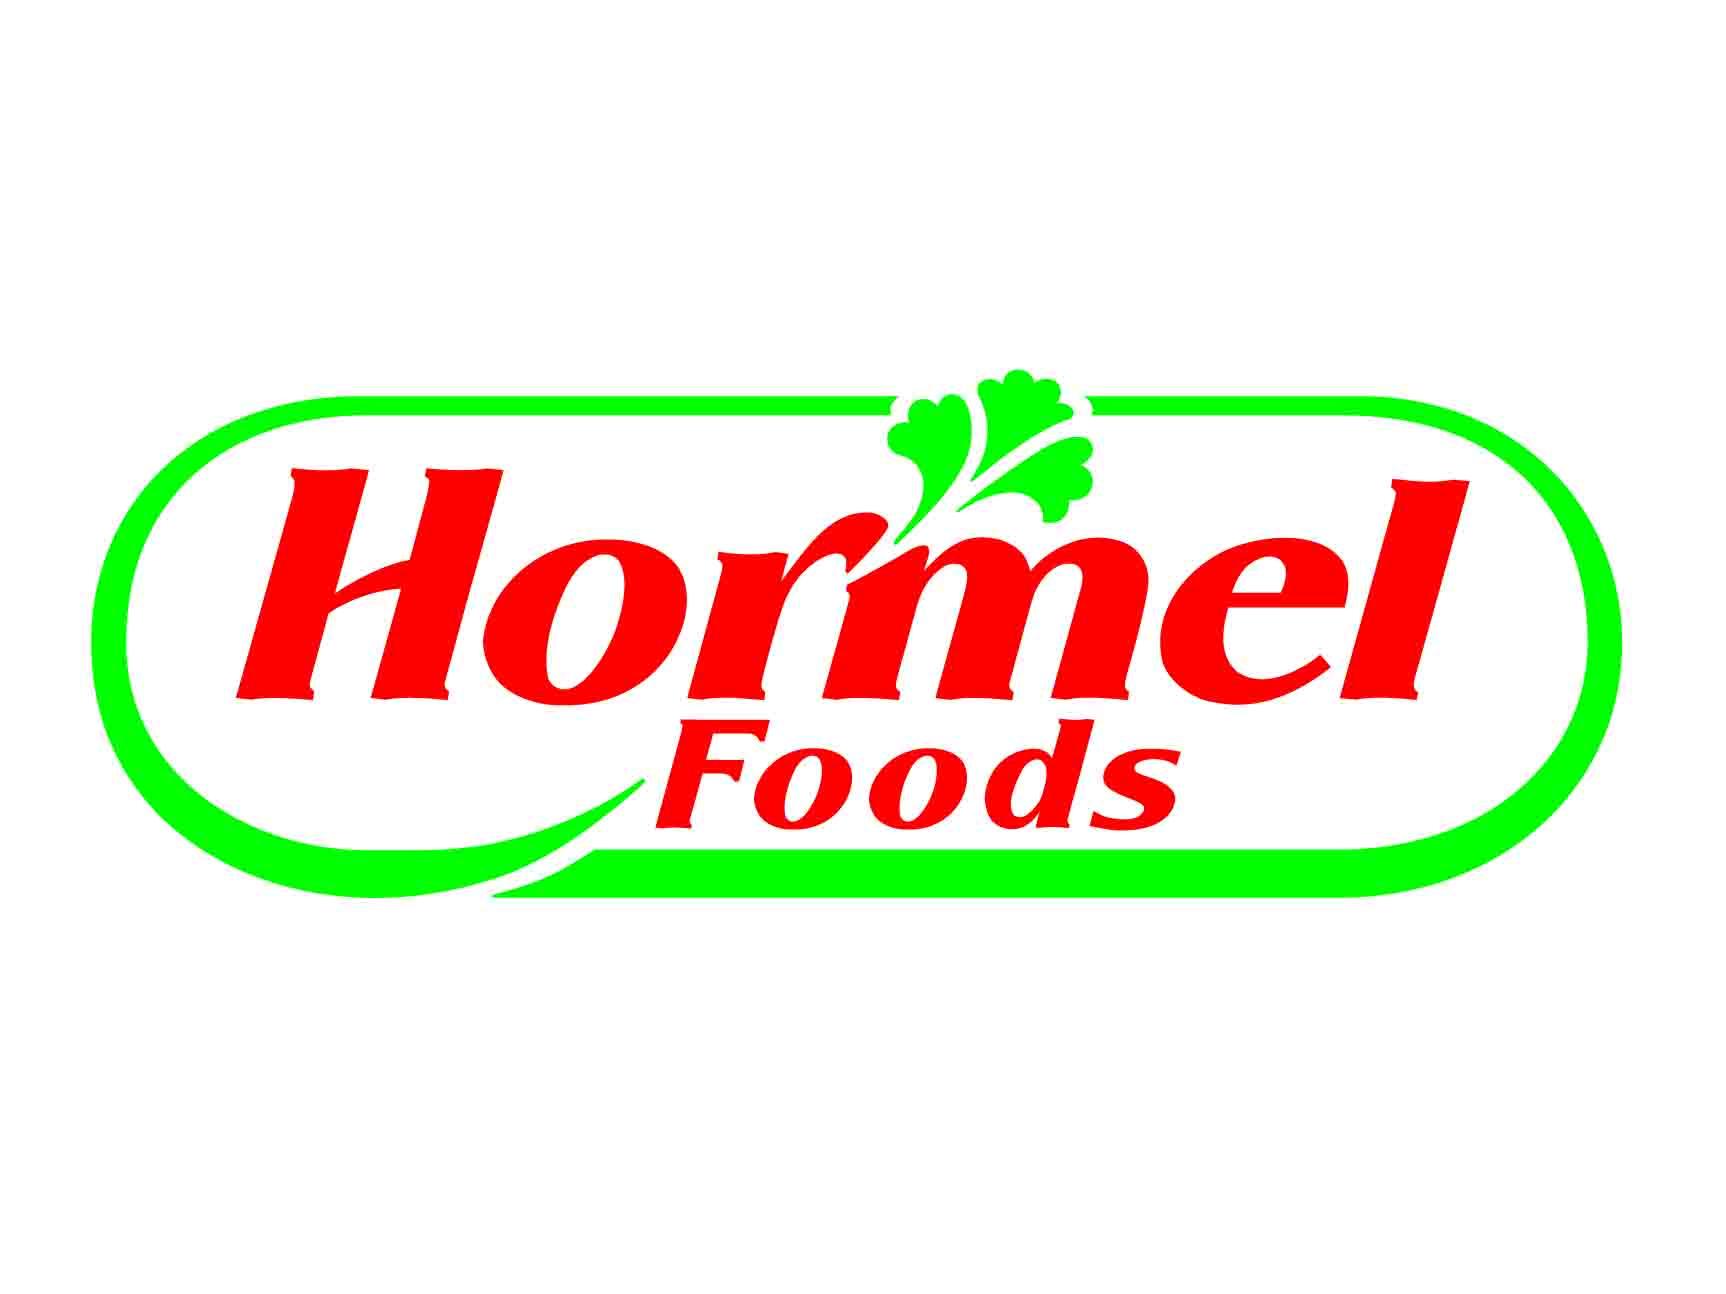 HORMEL FOODS.jpg